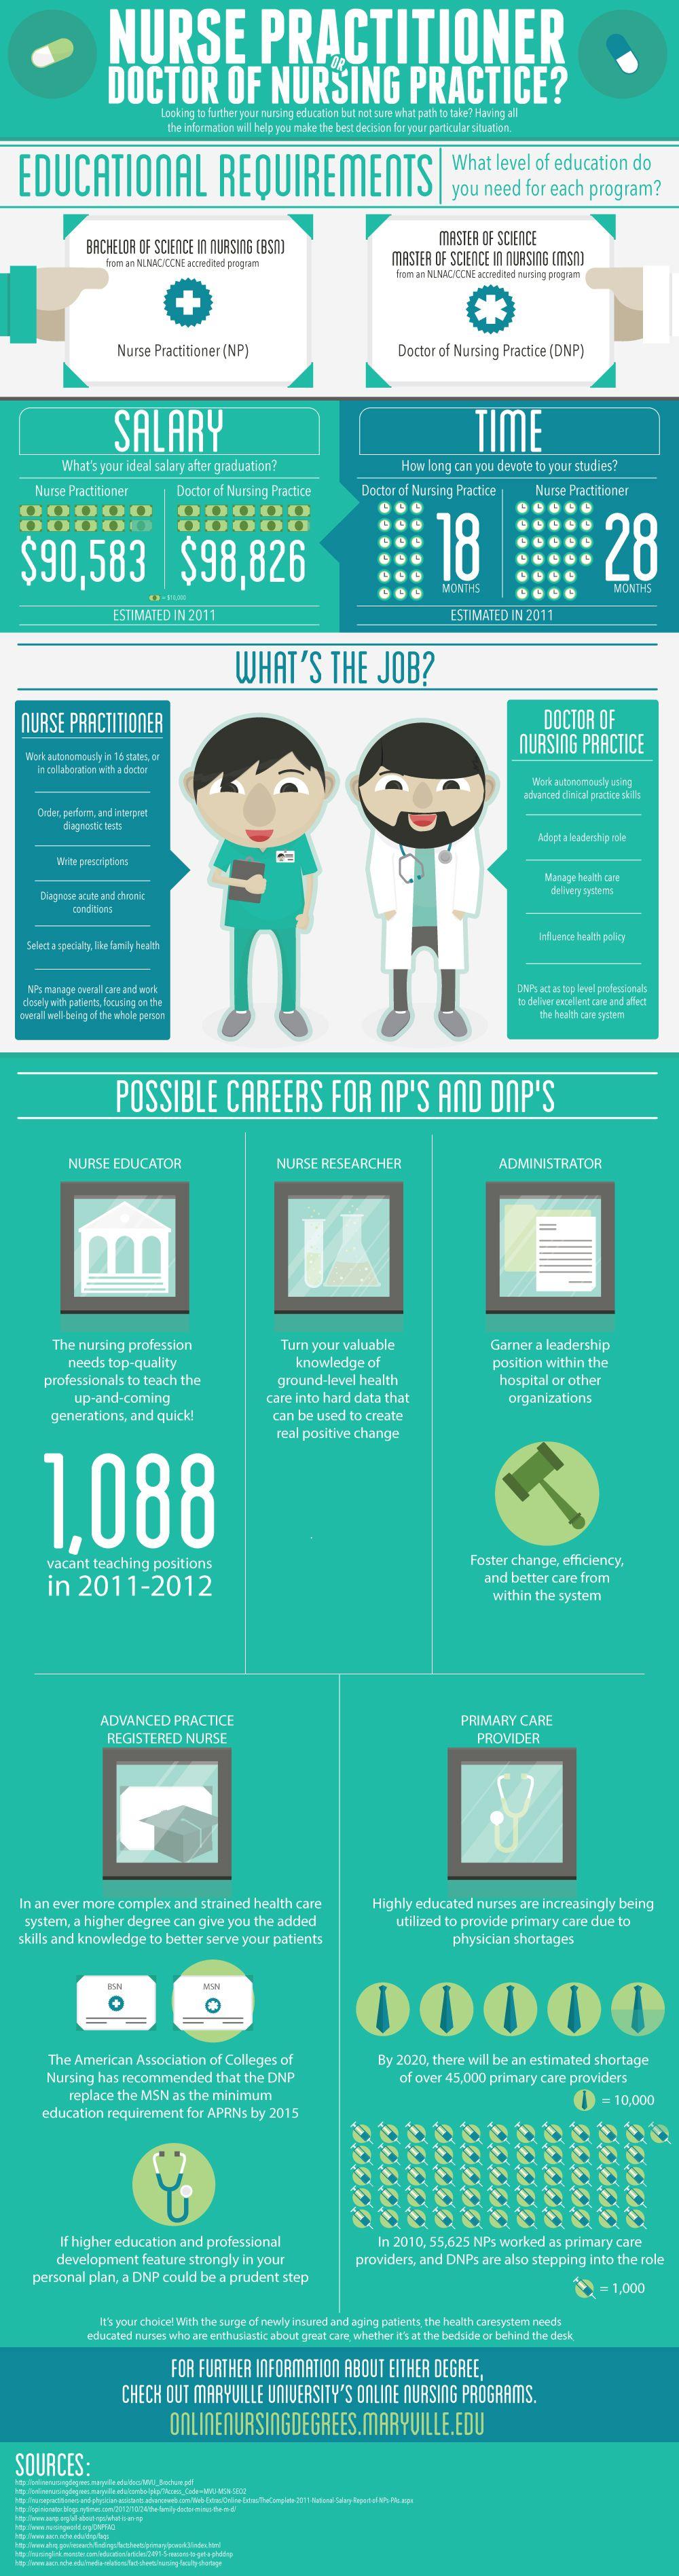 Helpful np vs dnp infographic doctor of nursing